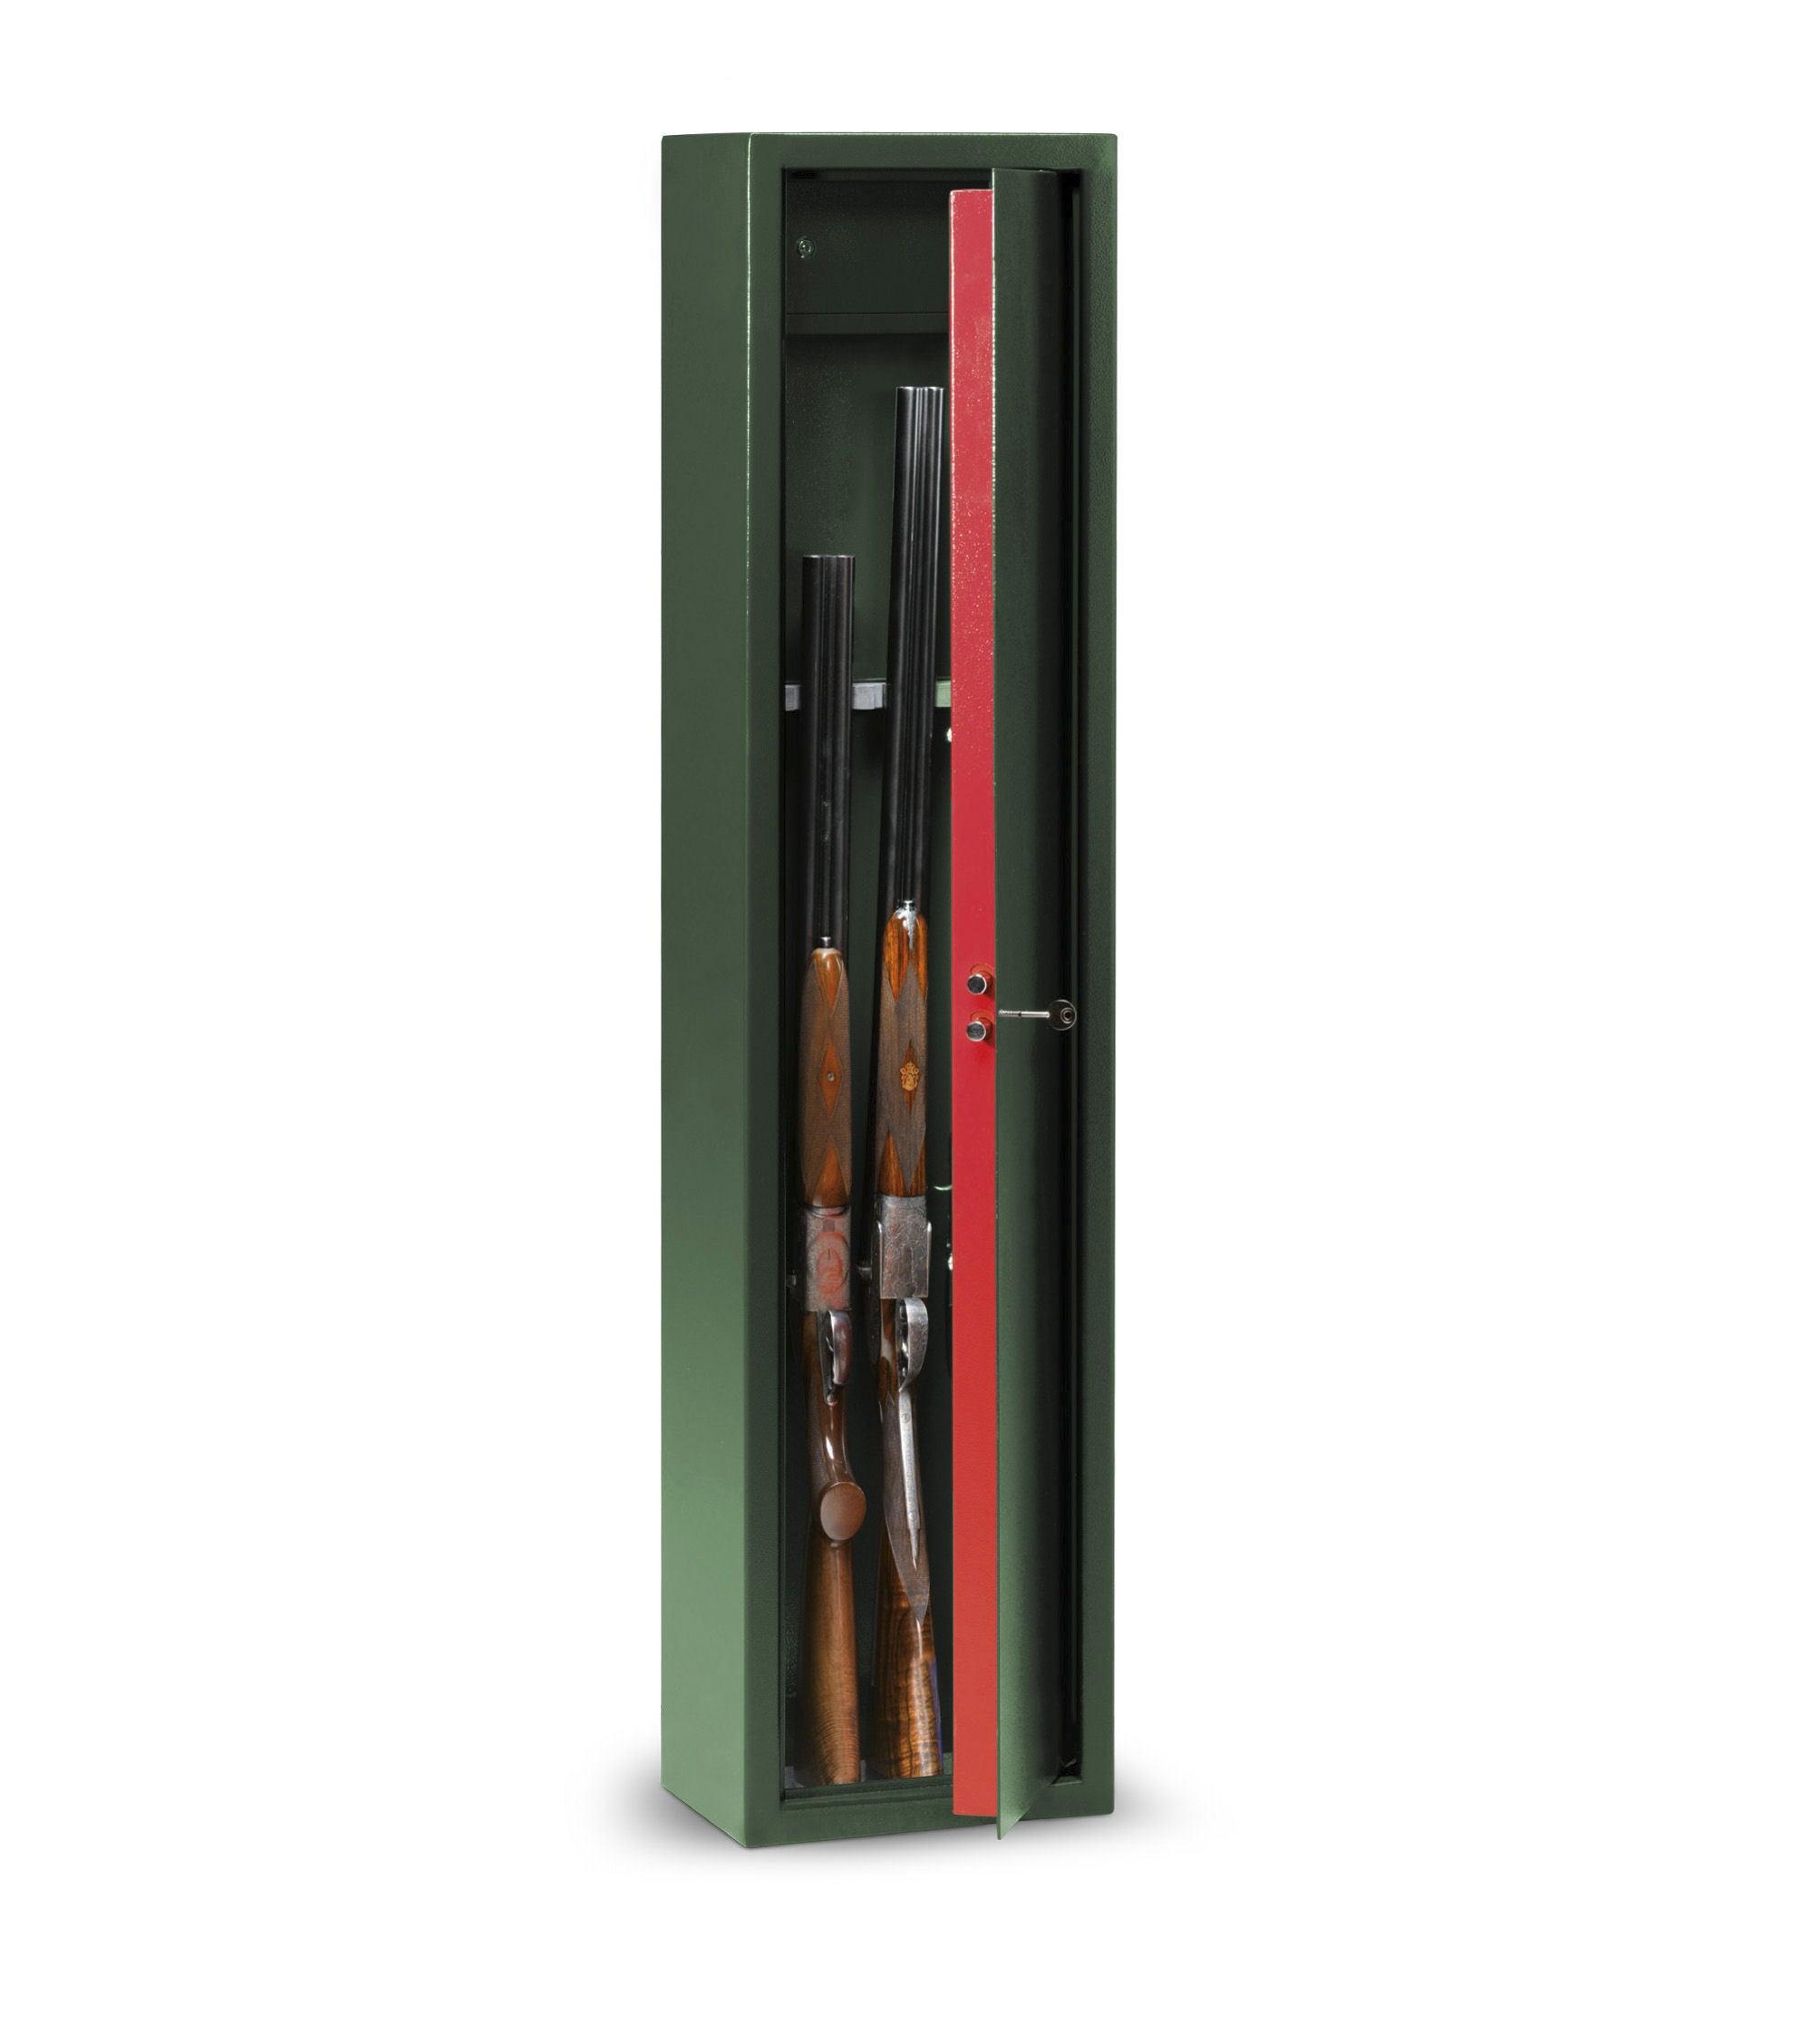 Armoire A Fusils A Cle 5 Fusils Technomax Lmk 5 H 138 X L 31 5 X P 22 Cm Leroy Merlin